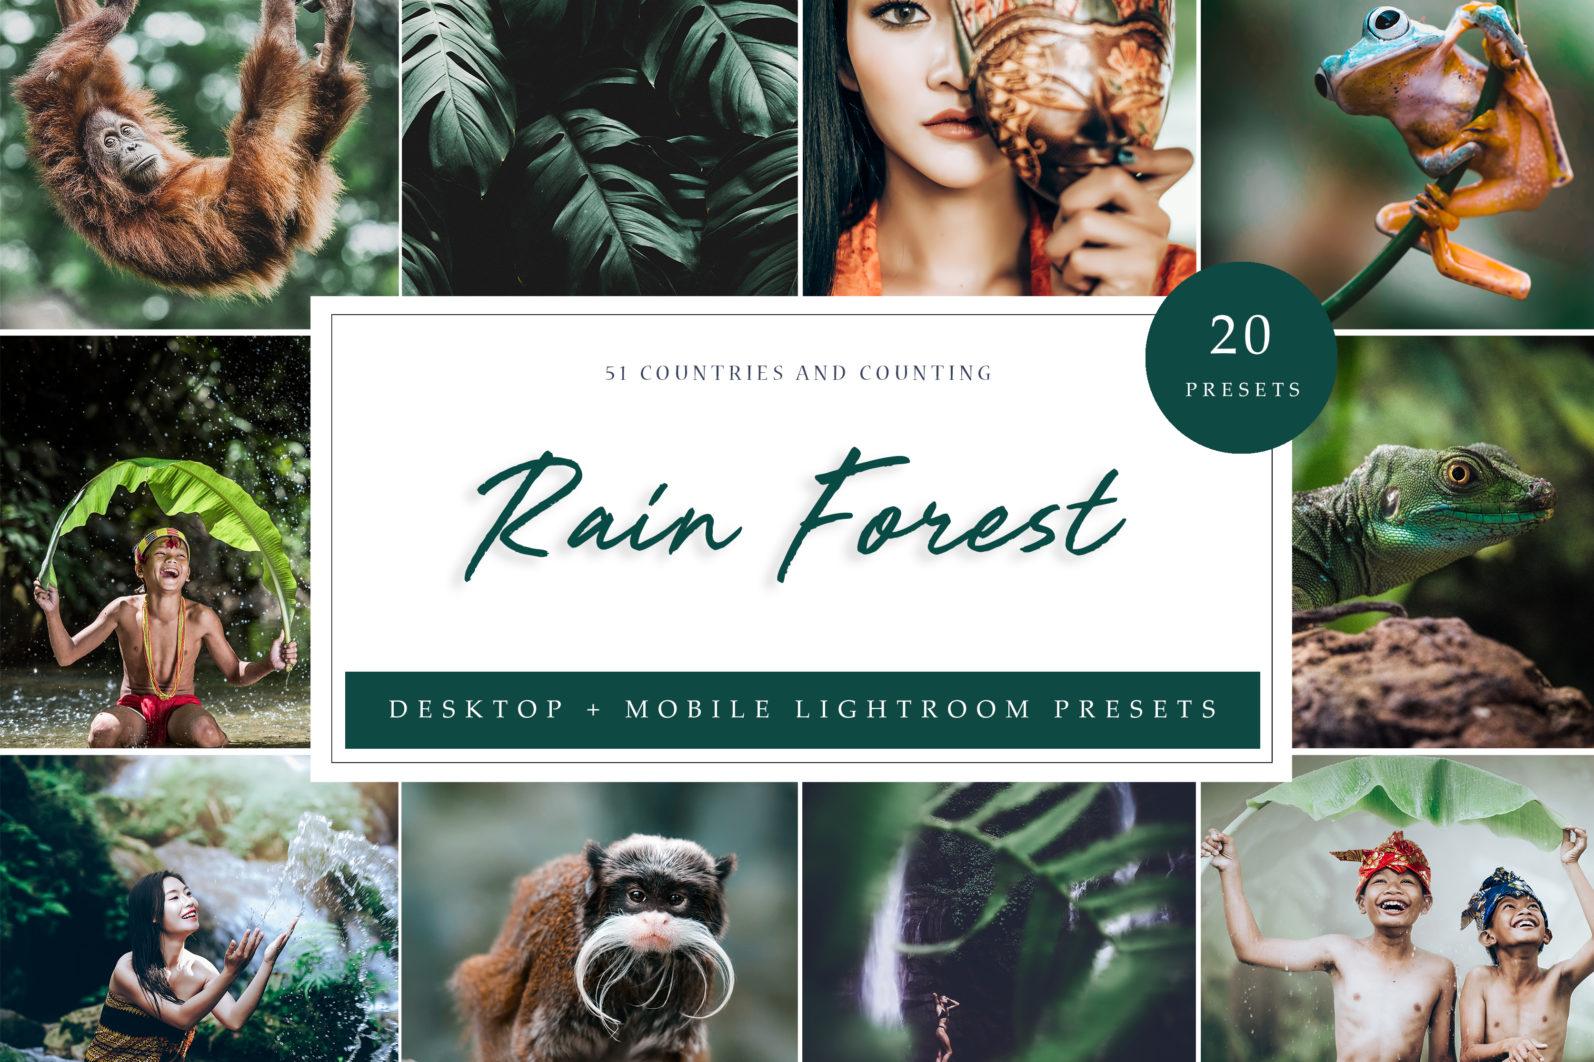 10 x Rain Forest Lightroom Presets | Green Lightroom Presets | Nature Presets - Rain Forest LR scaled -